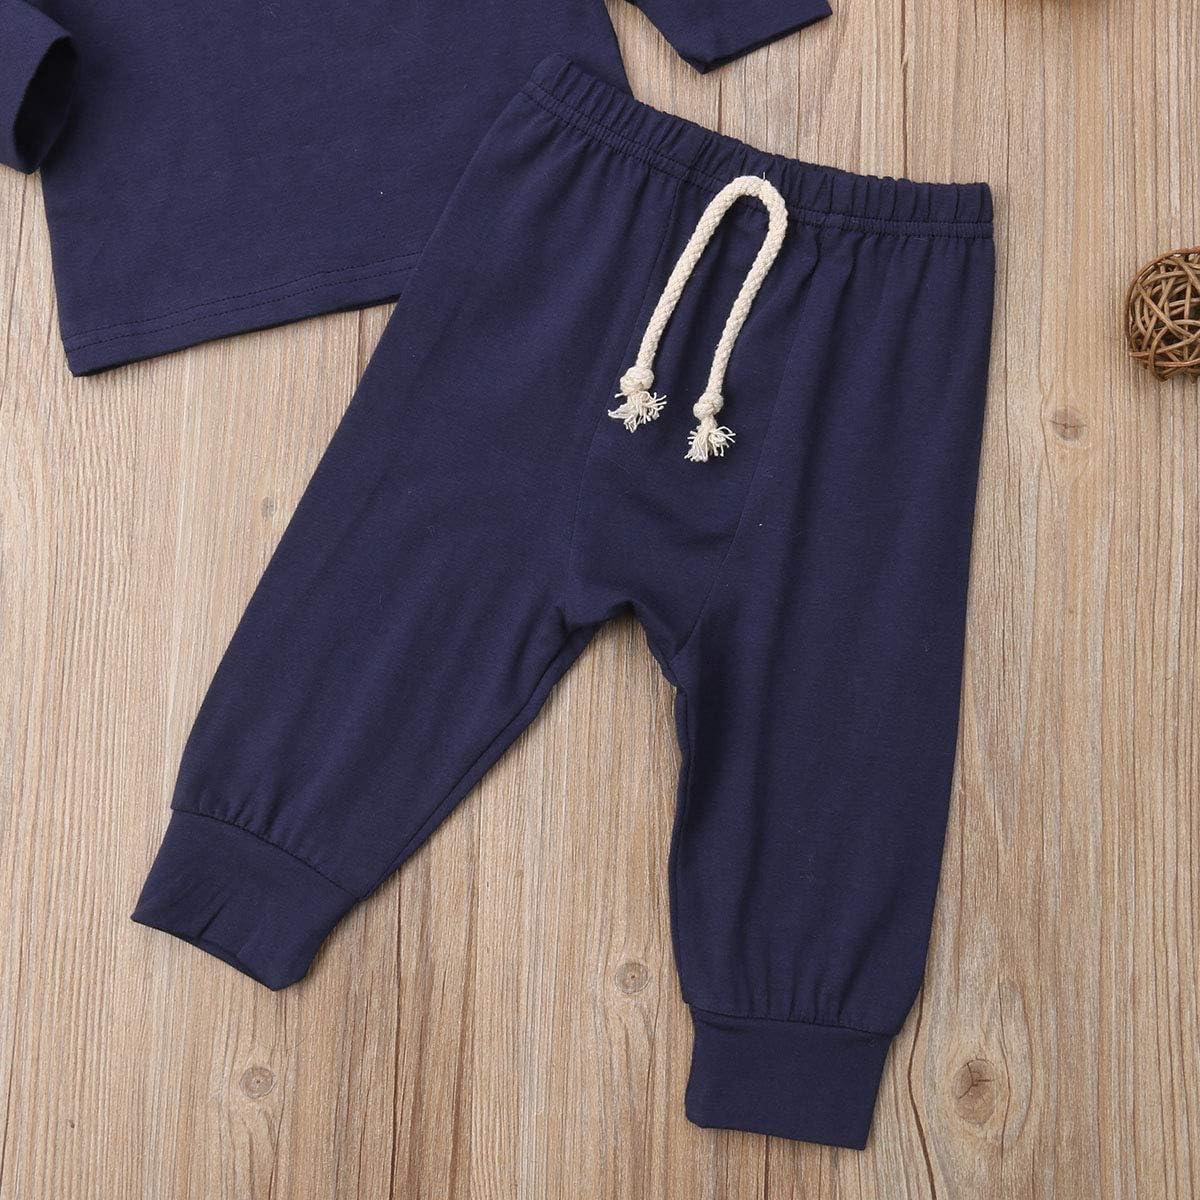 Newborn Baby Pajama Set Unisex Long Sleeve Tops Drawstring Pant Sleepwear Outfit